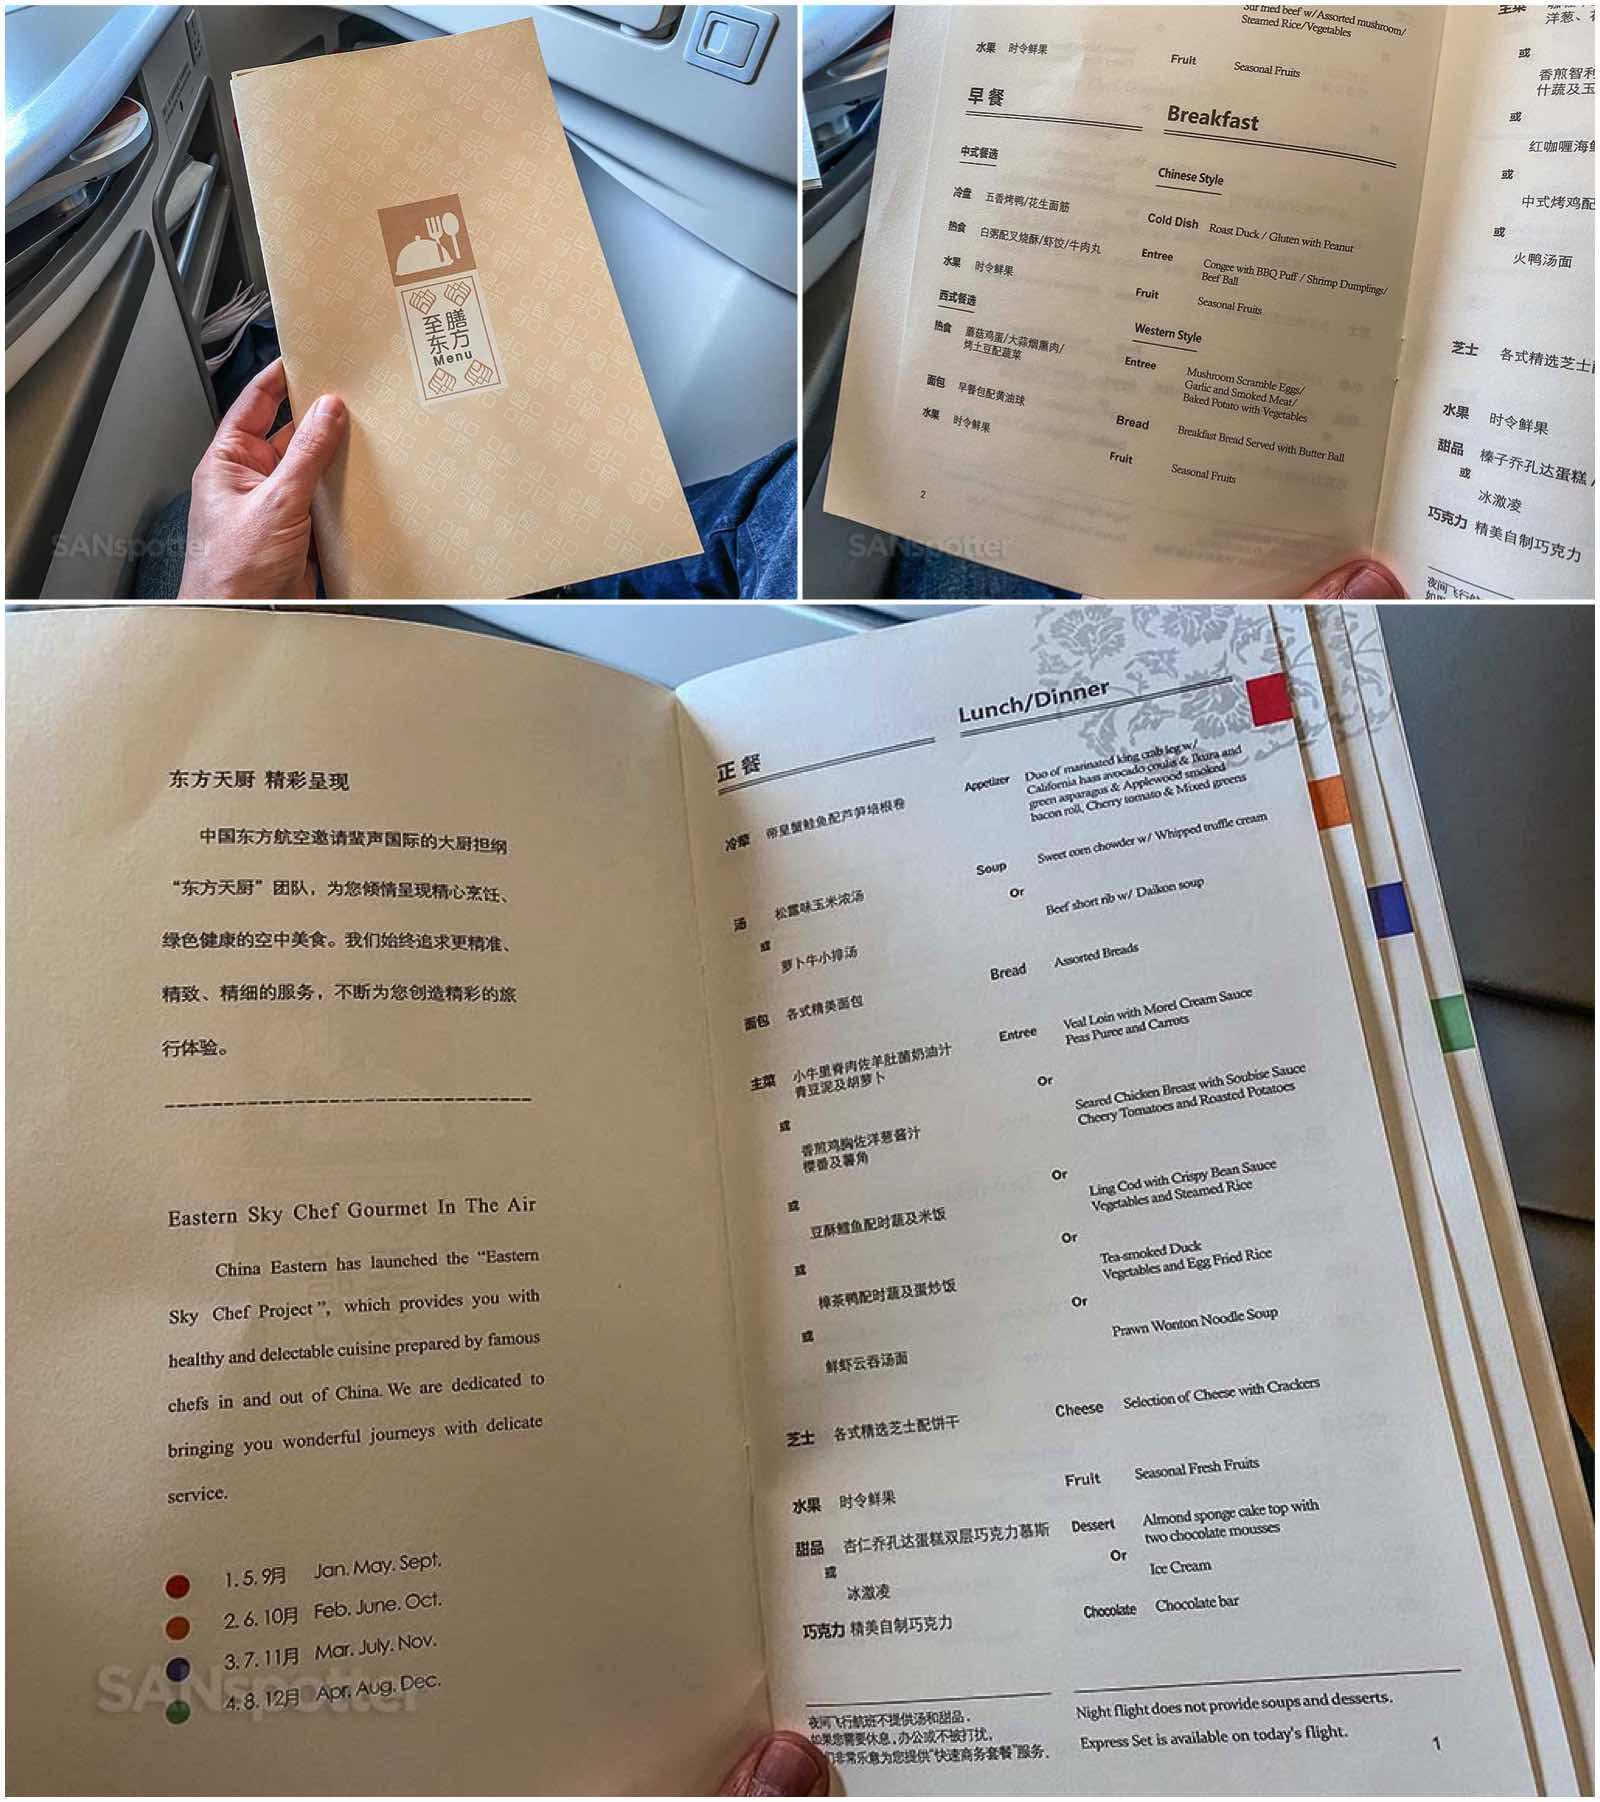 China Eastern business class menu